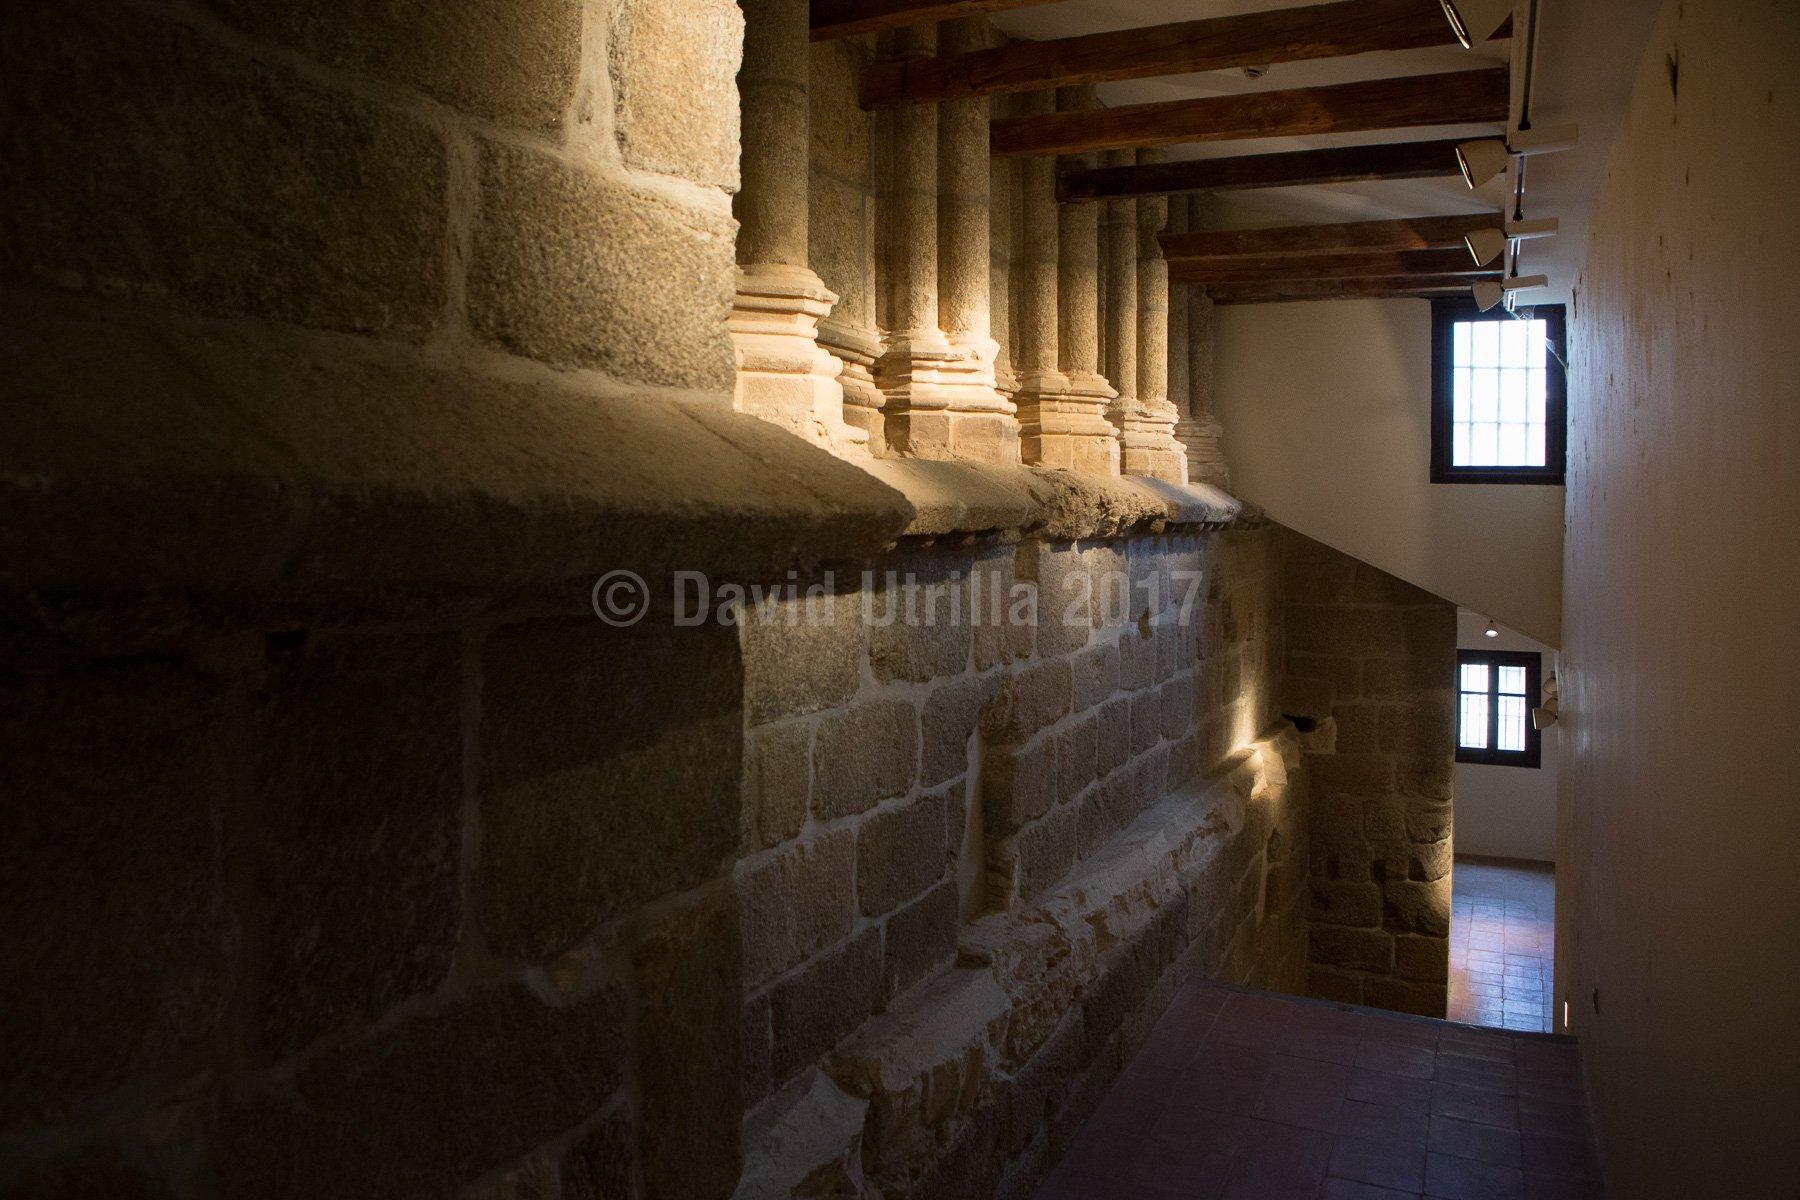 Pasadizos de la Catedral de Toledo